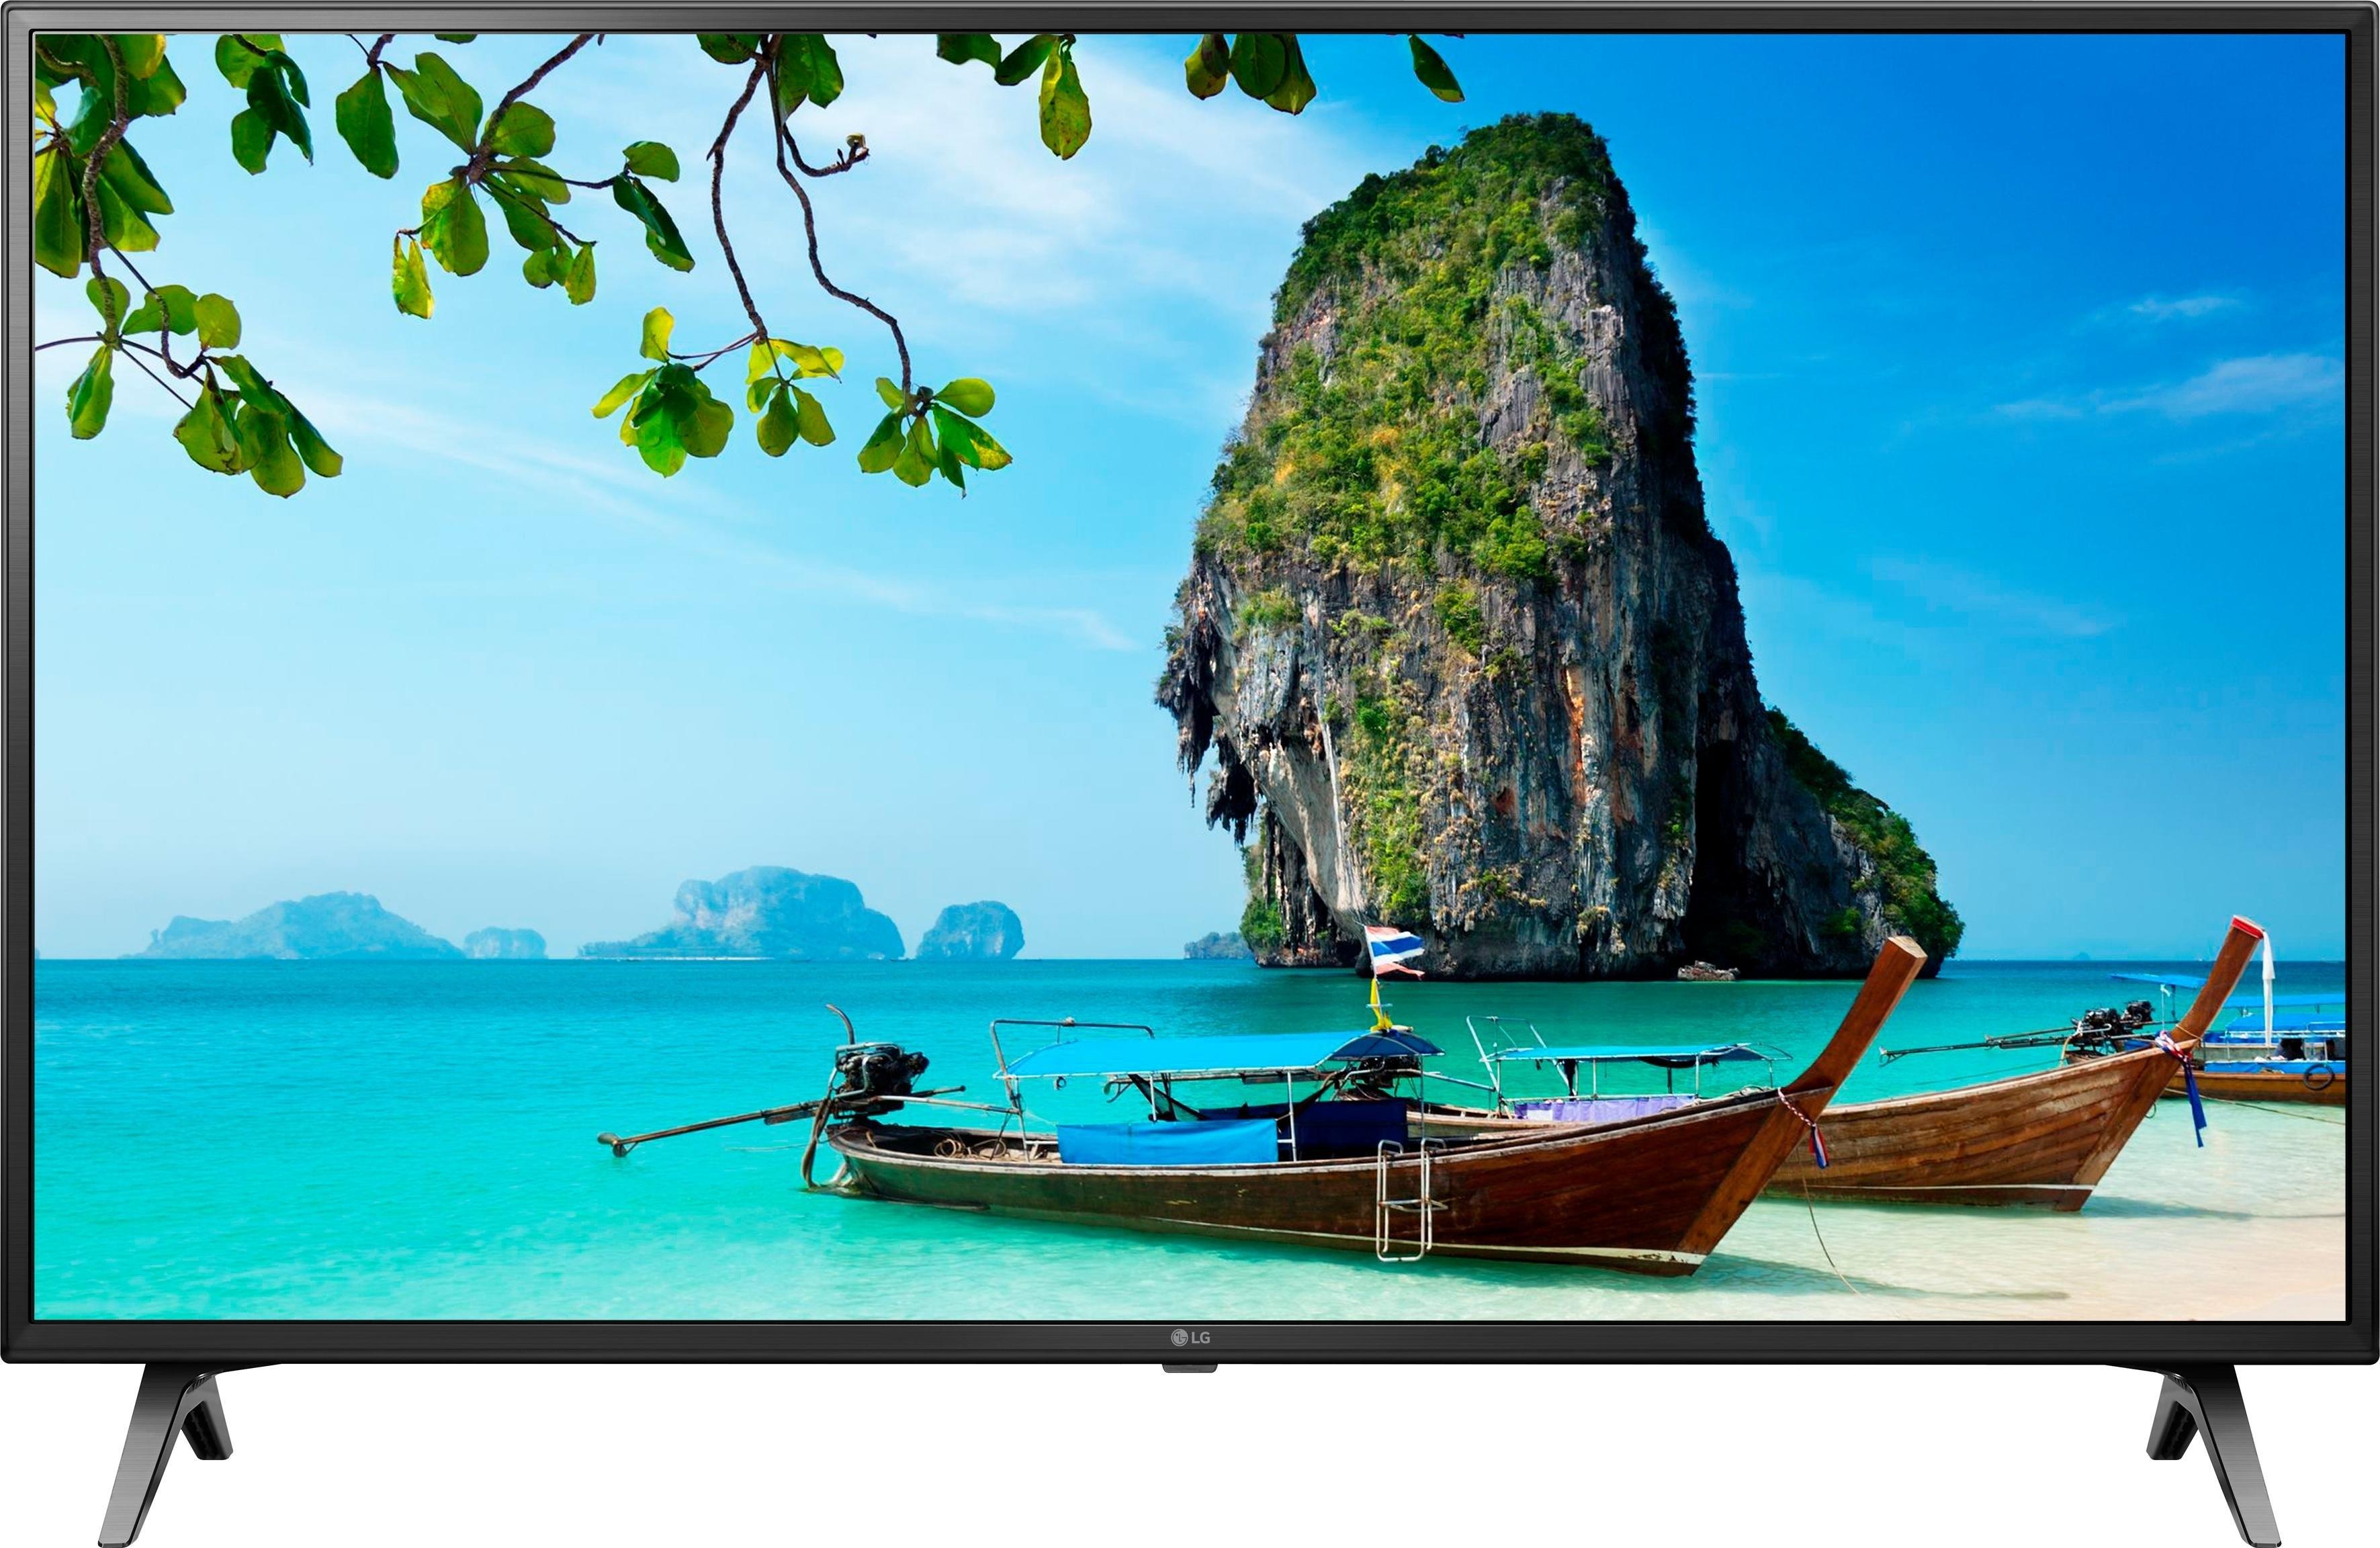 LG 43UM71007LB lcd-led-tv (108 cm / 43 inch), 4K Ultra HD, Smart-TV goedkoop op otto.nl kopen